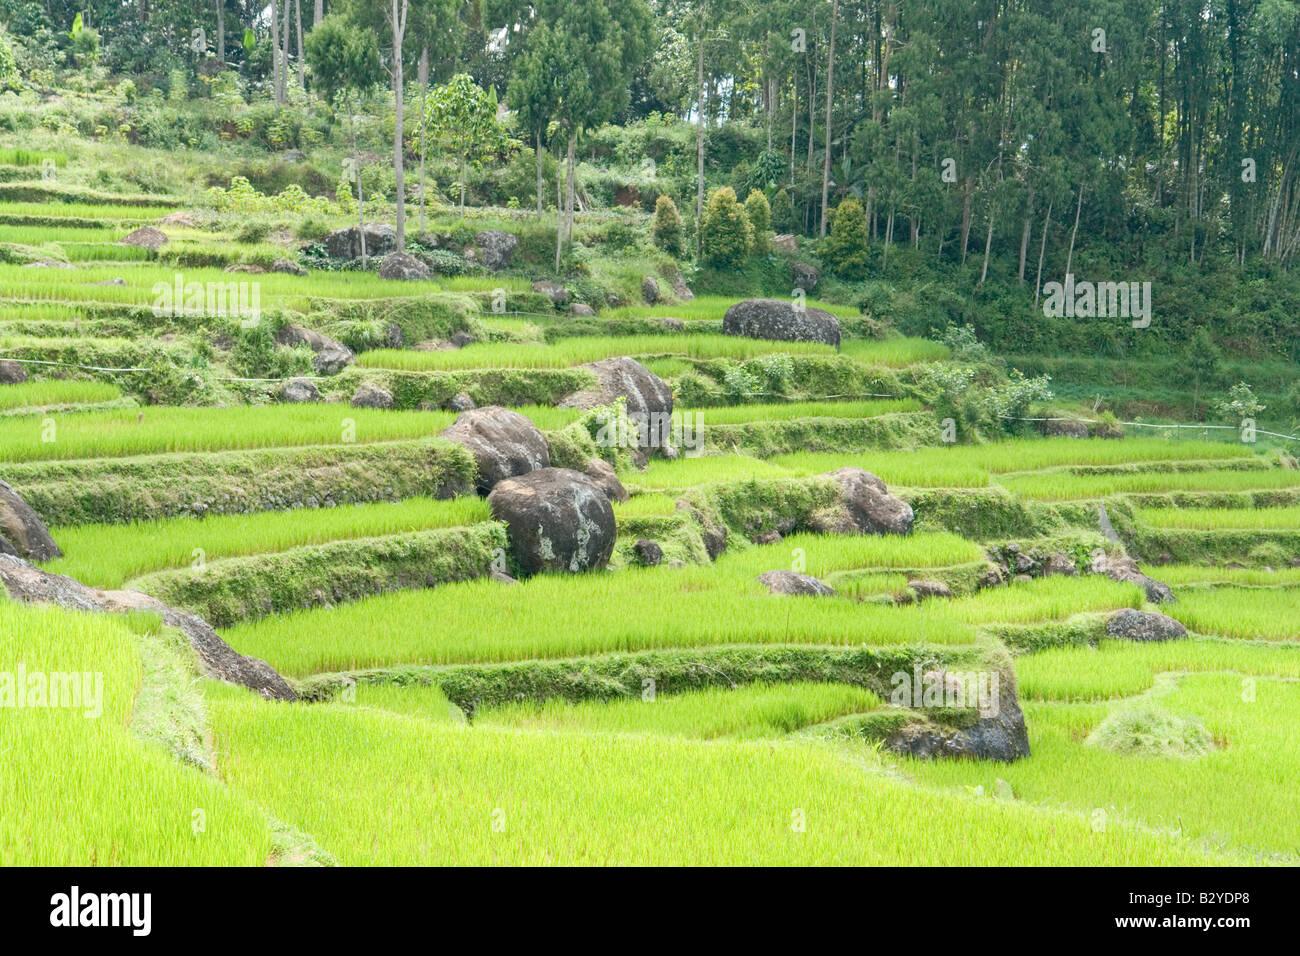 Terraced paddy fields in the neighbourhood of Batutumonga (Sulawesi). Rizières en terrasse aux environs de - Stock Image